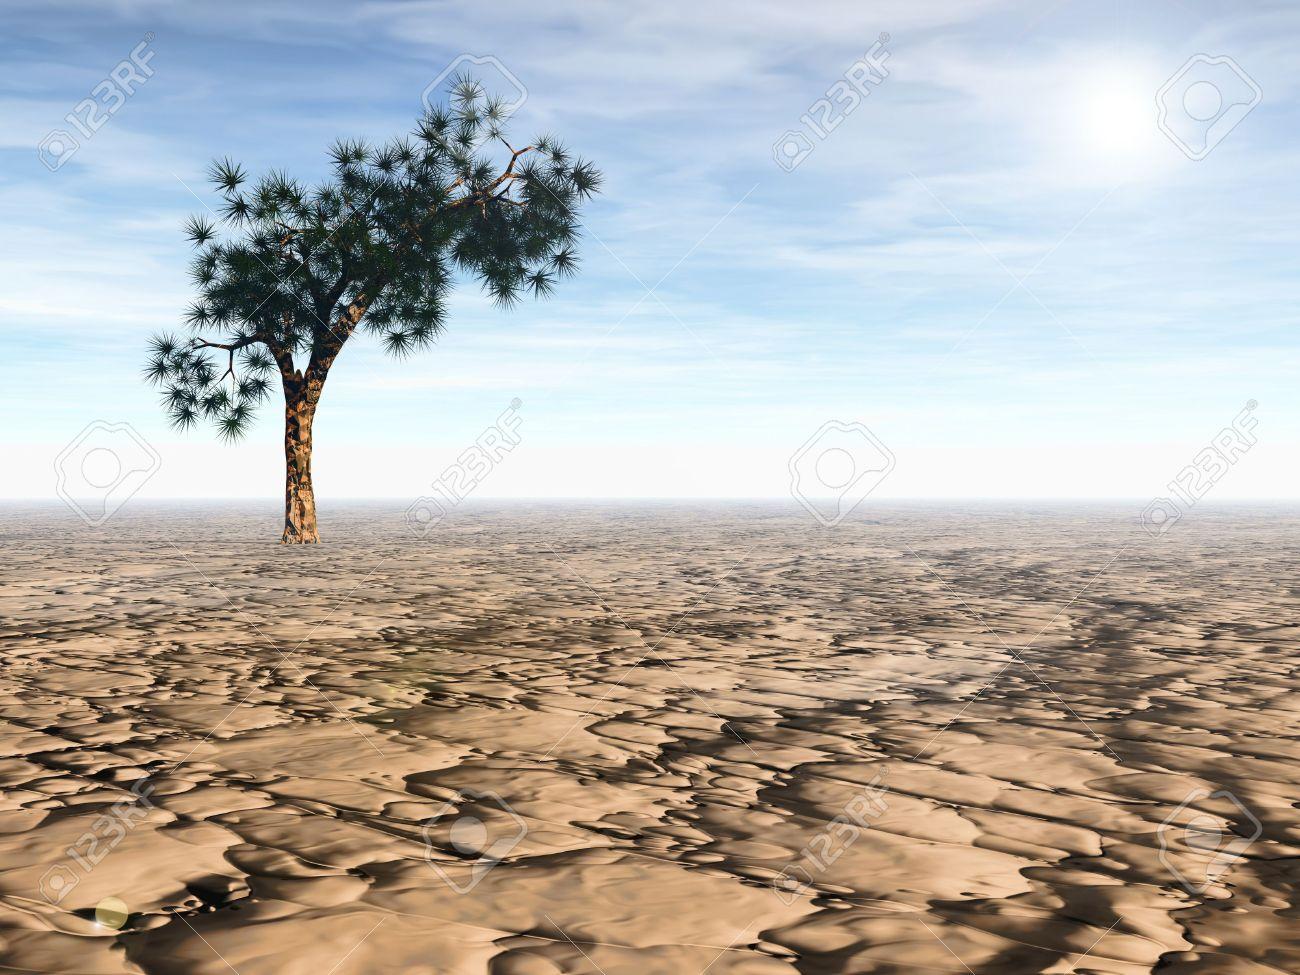 3D rendering of an isolated Joshua tree in arid desert under bright sun Stock Photo - 6854824